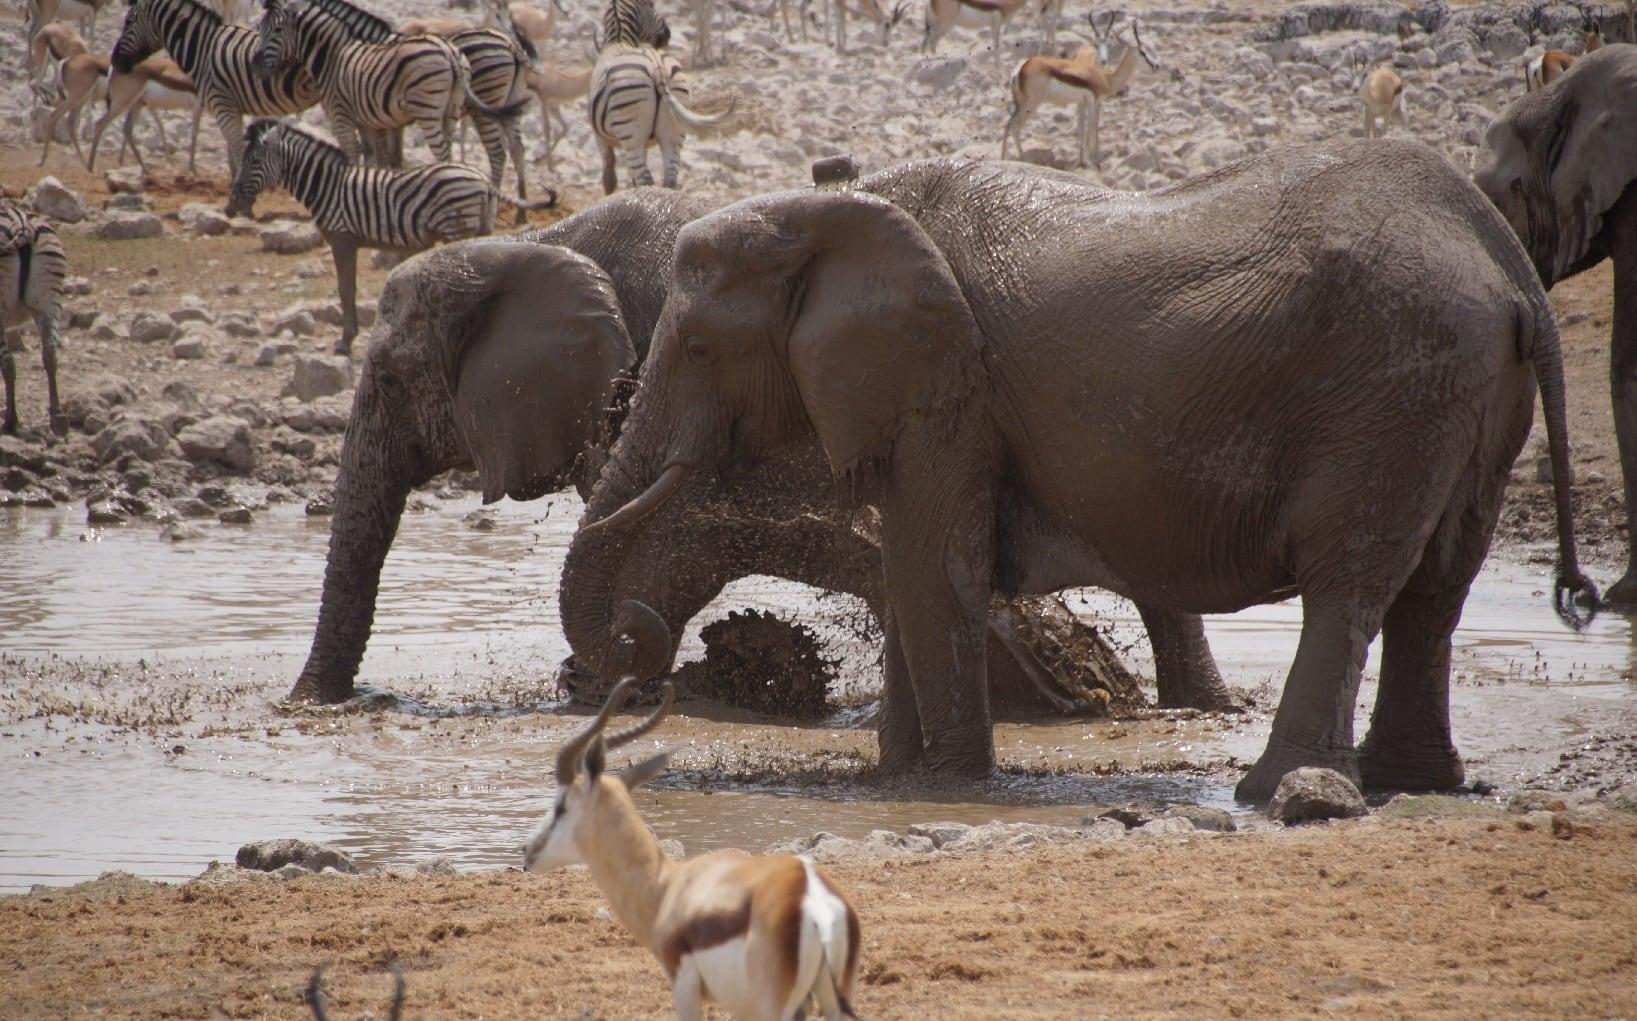 Elefanten im Wasserbad im Etosha Nationalpark